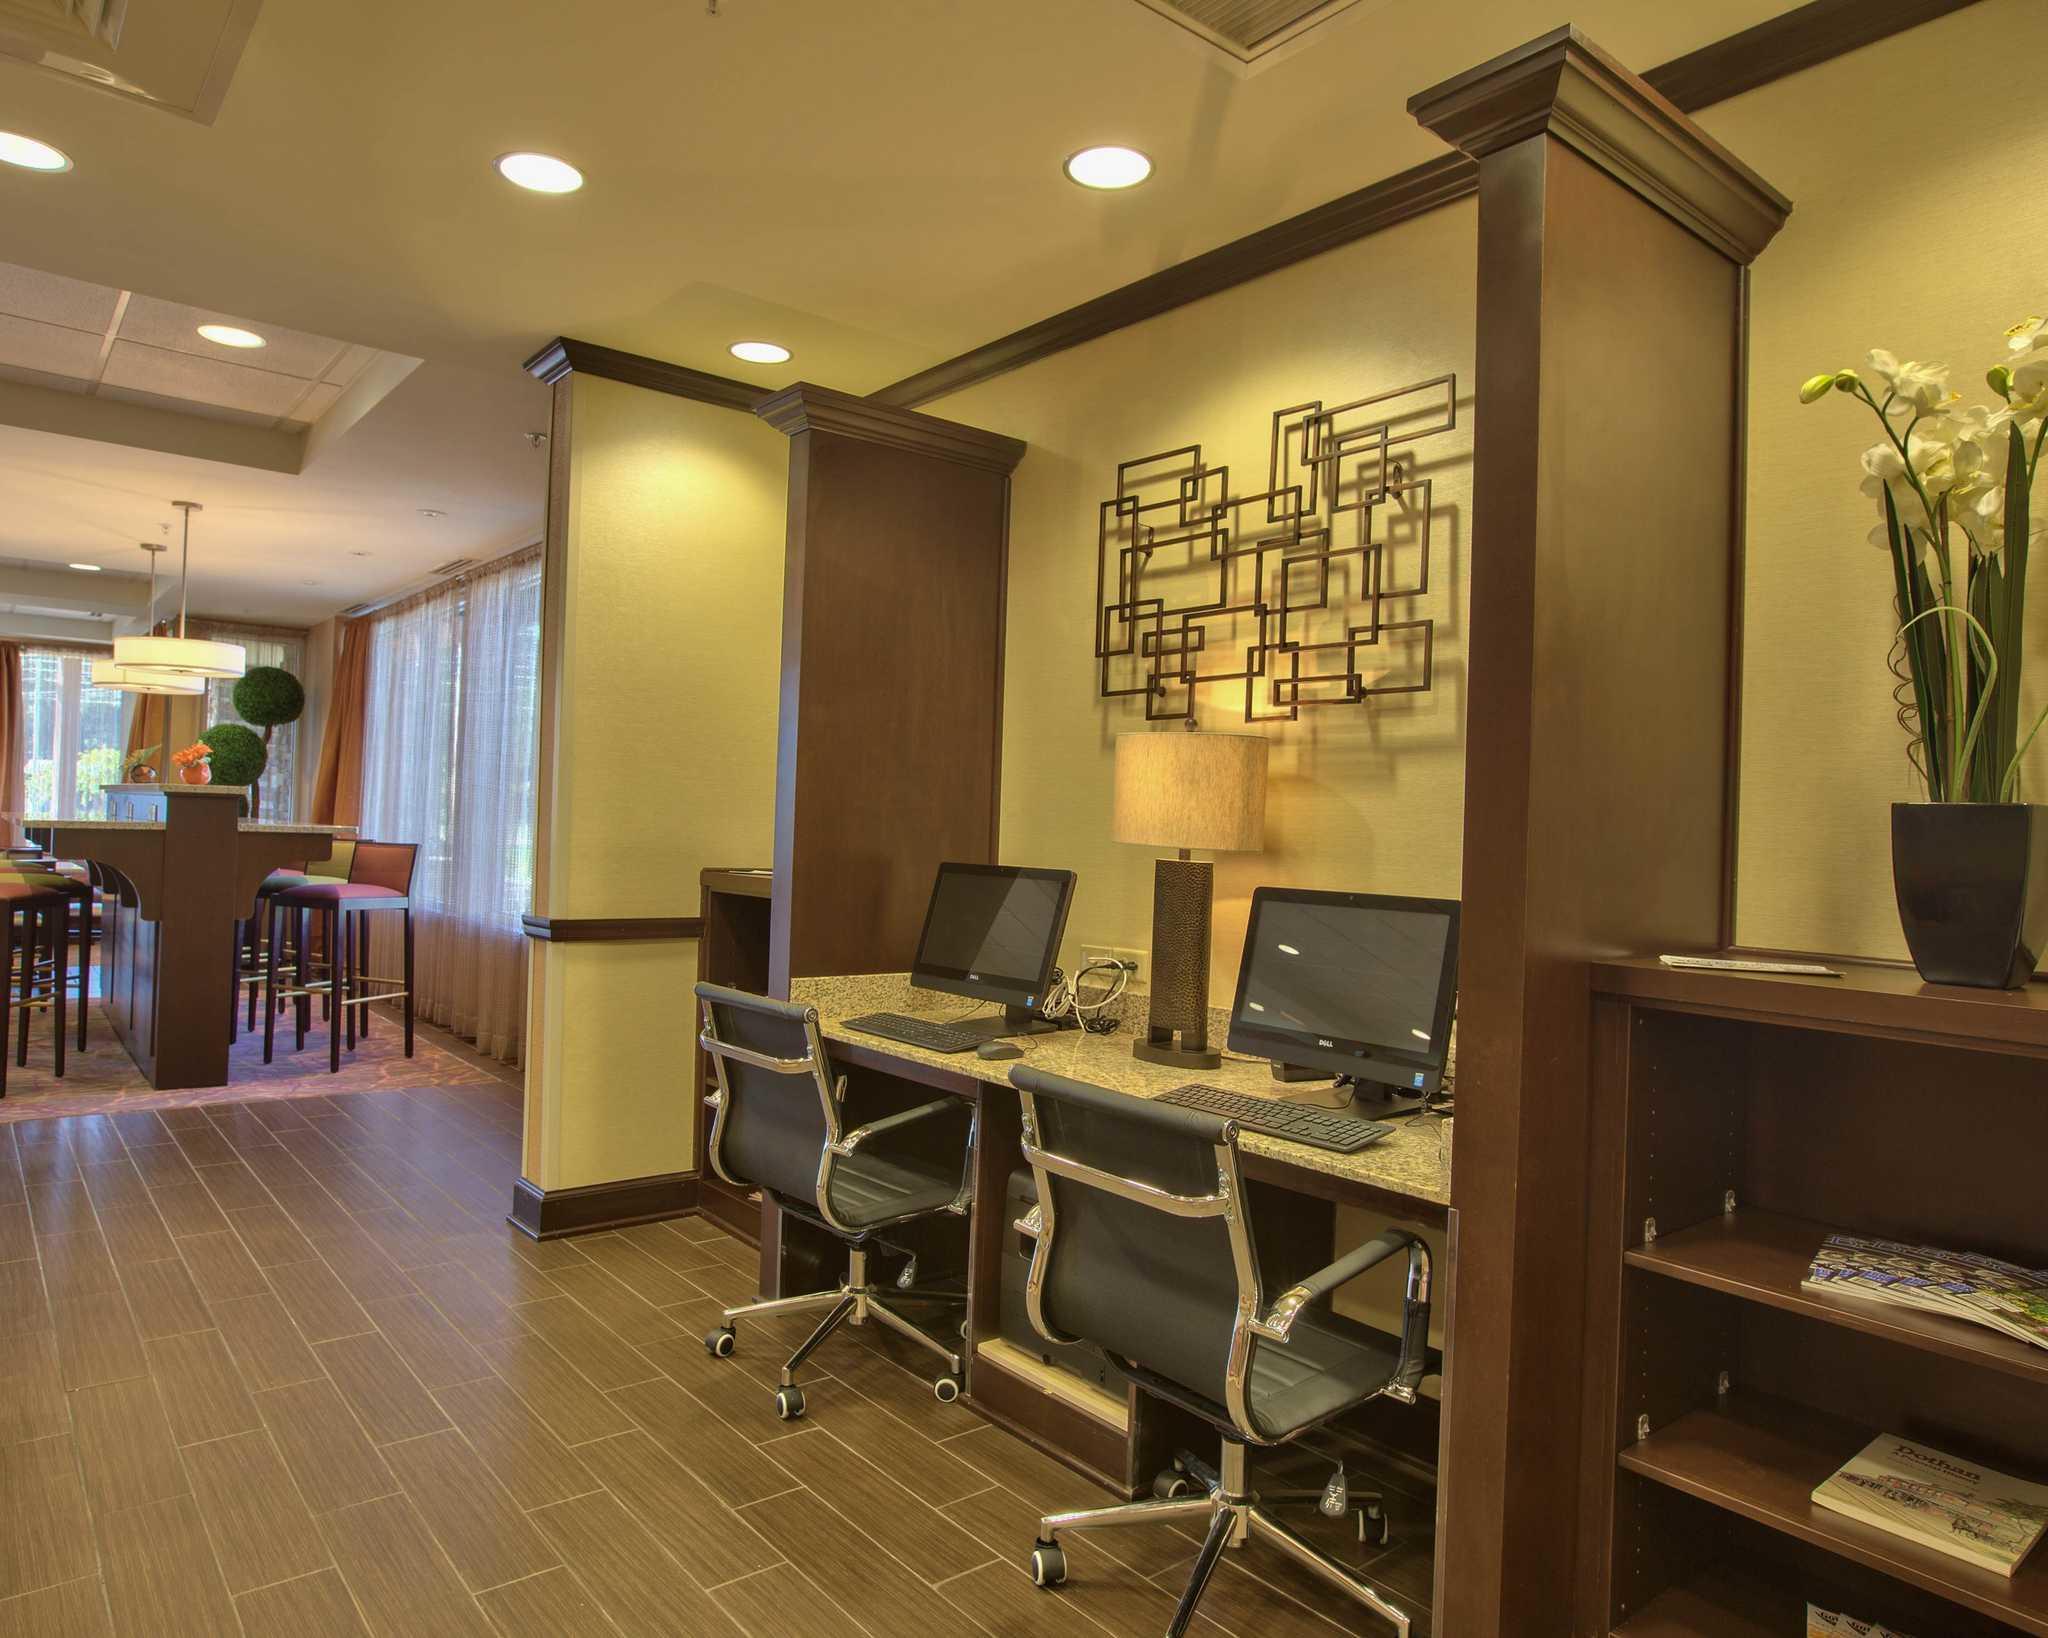 Comfort Inn & Suites image 34